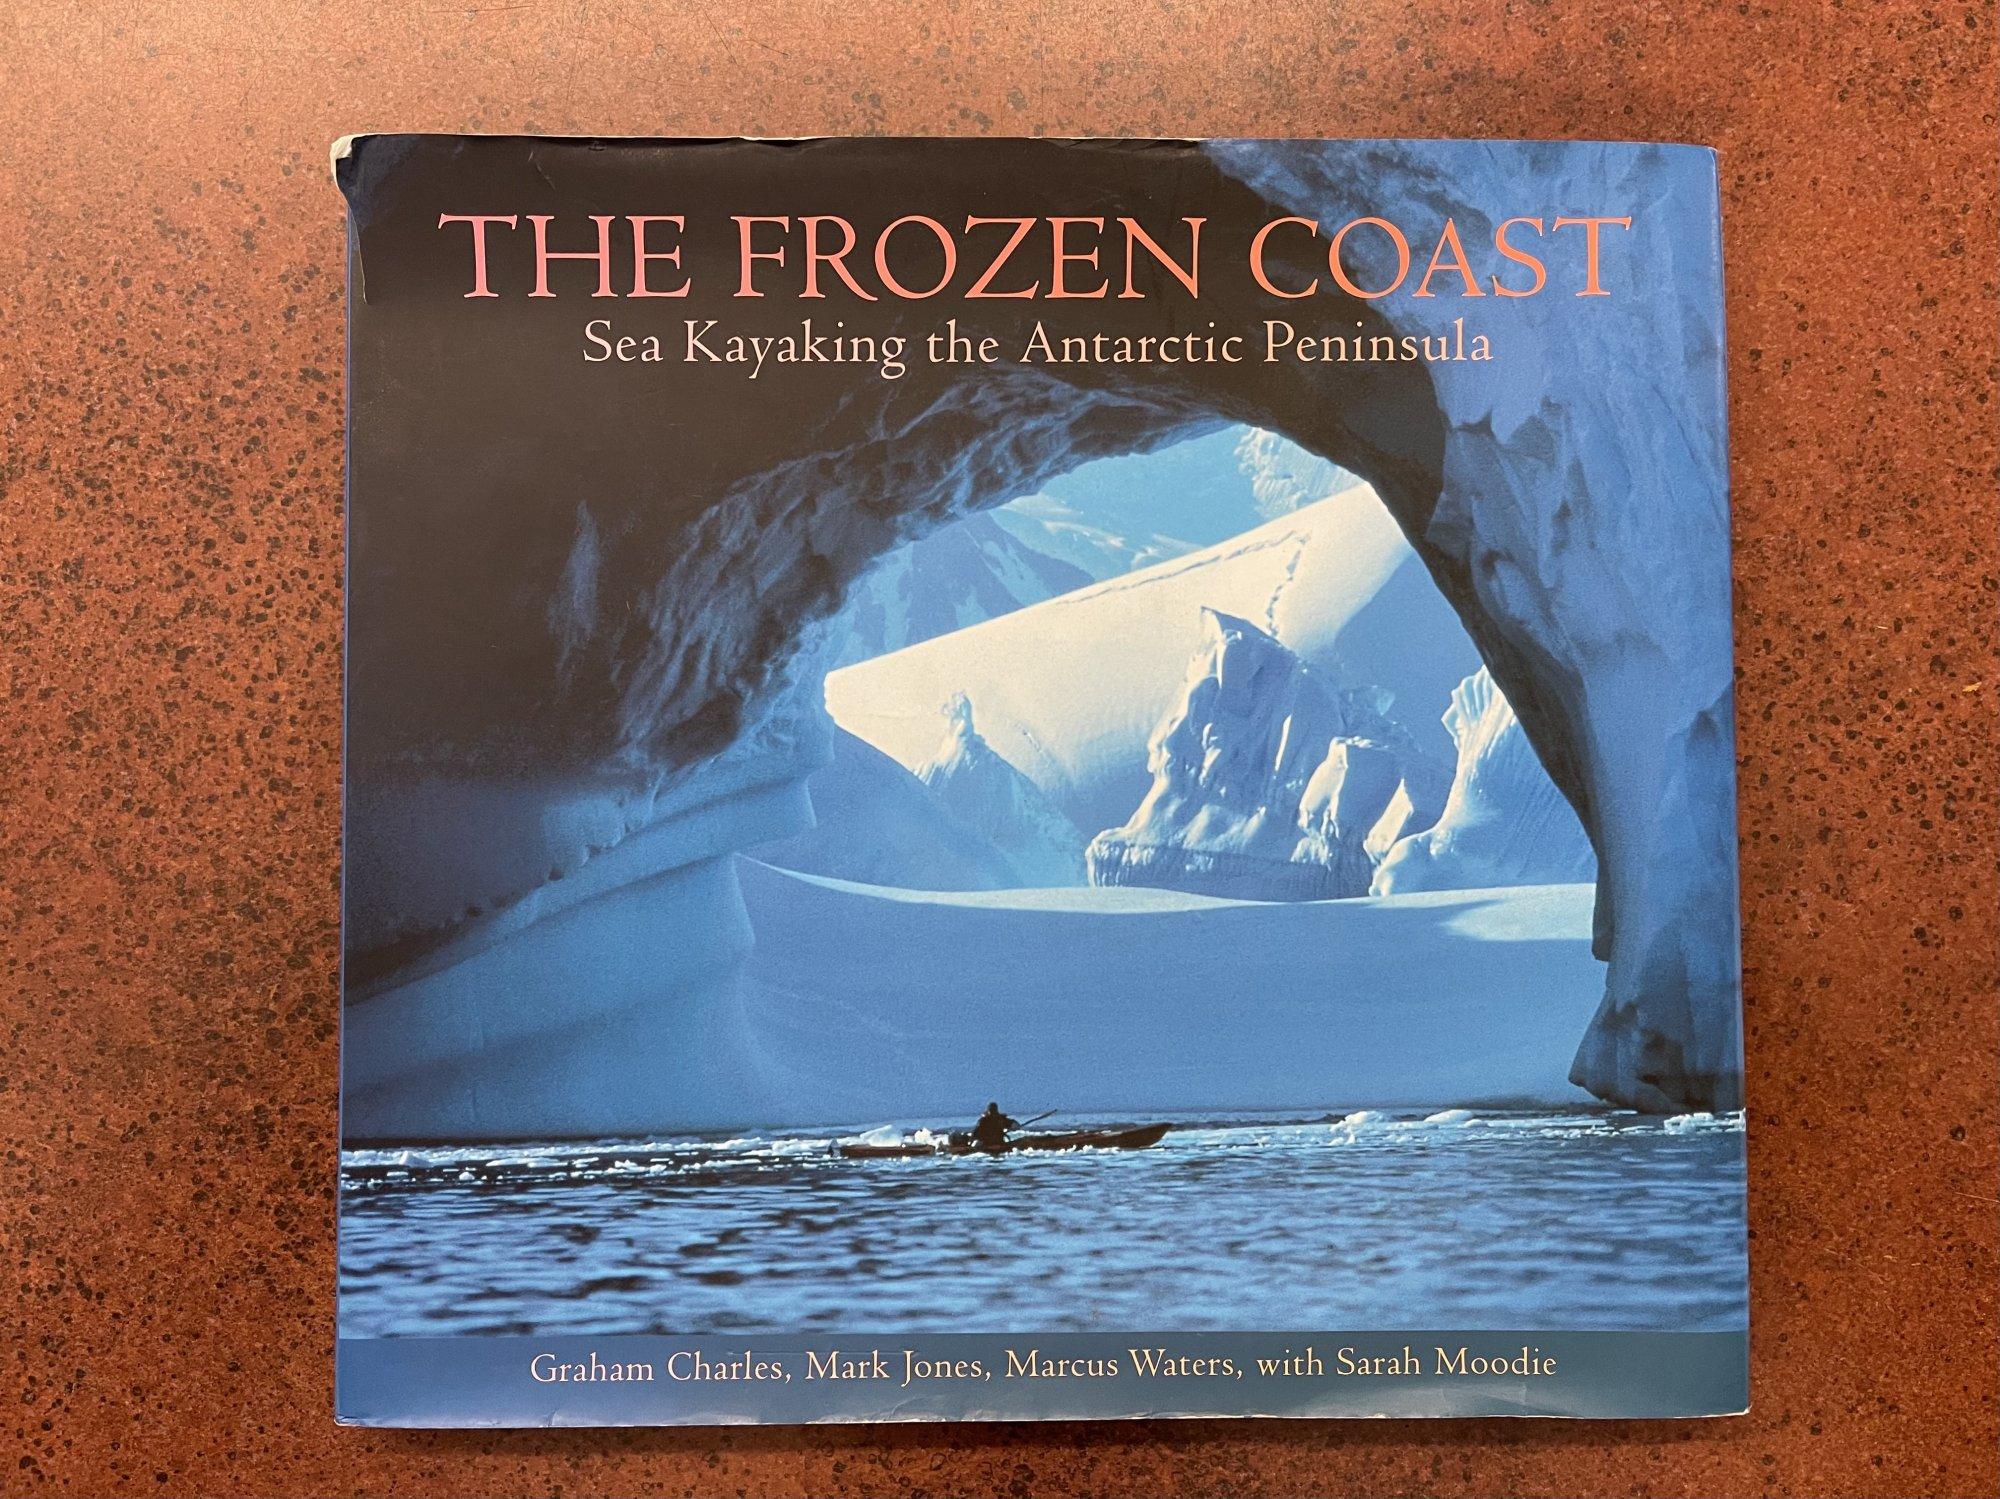 The Frozen Coast: Sea Kayaking the Antarctic Peninsula - Hardcover